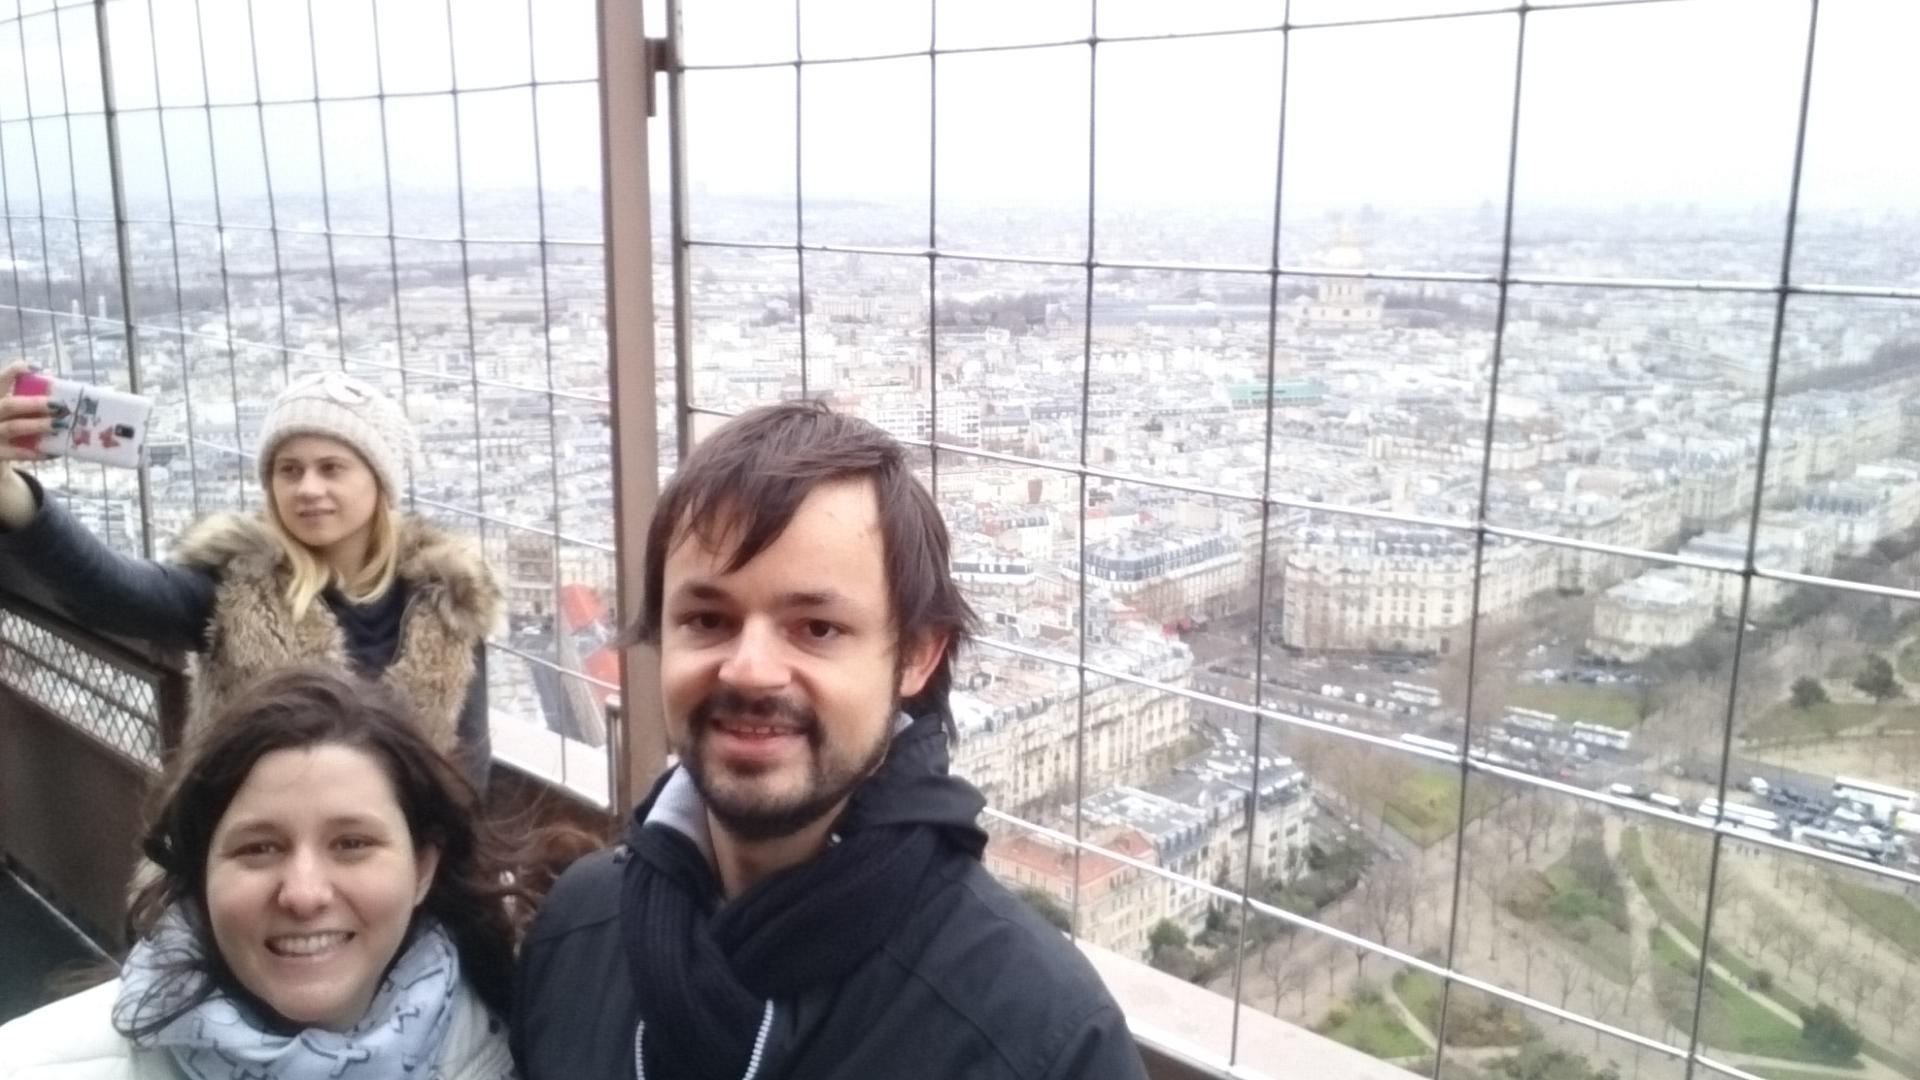 DSC 1939 - Visitando la Torre Eiffel en Paris